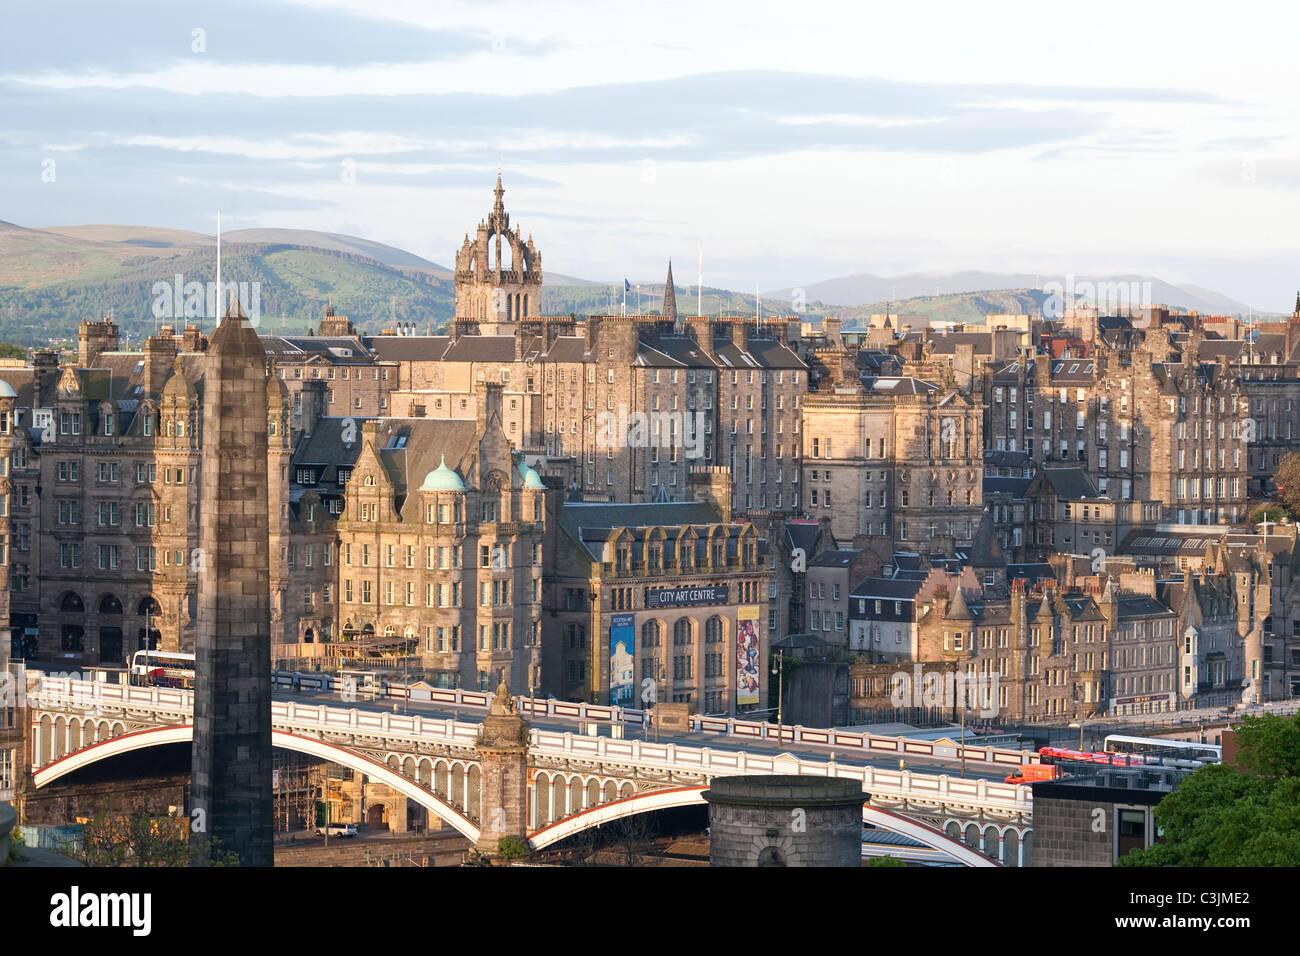 North Bridge The Old Town, Edinburgh, Scotland, United Kingdom - Stock Image